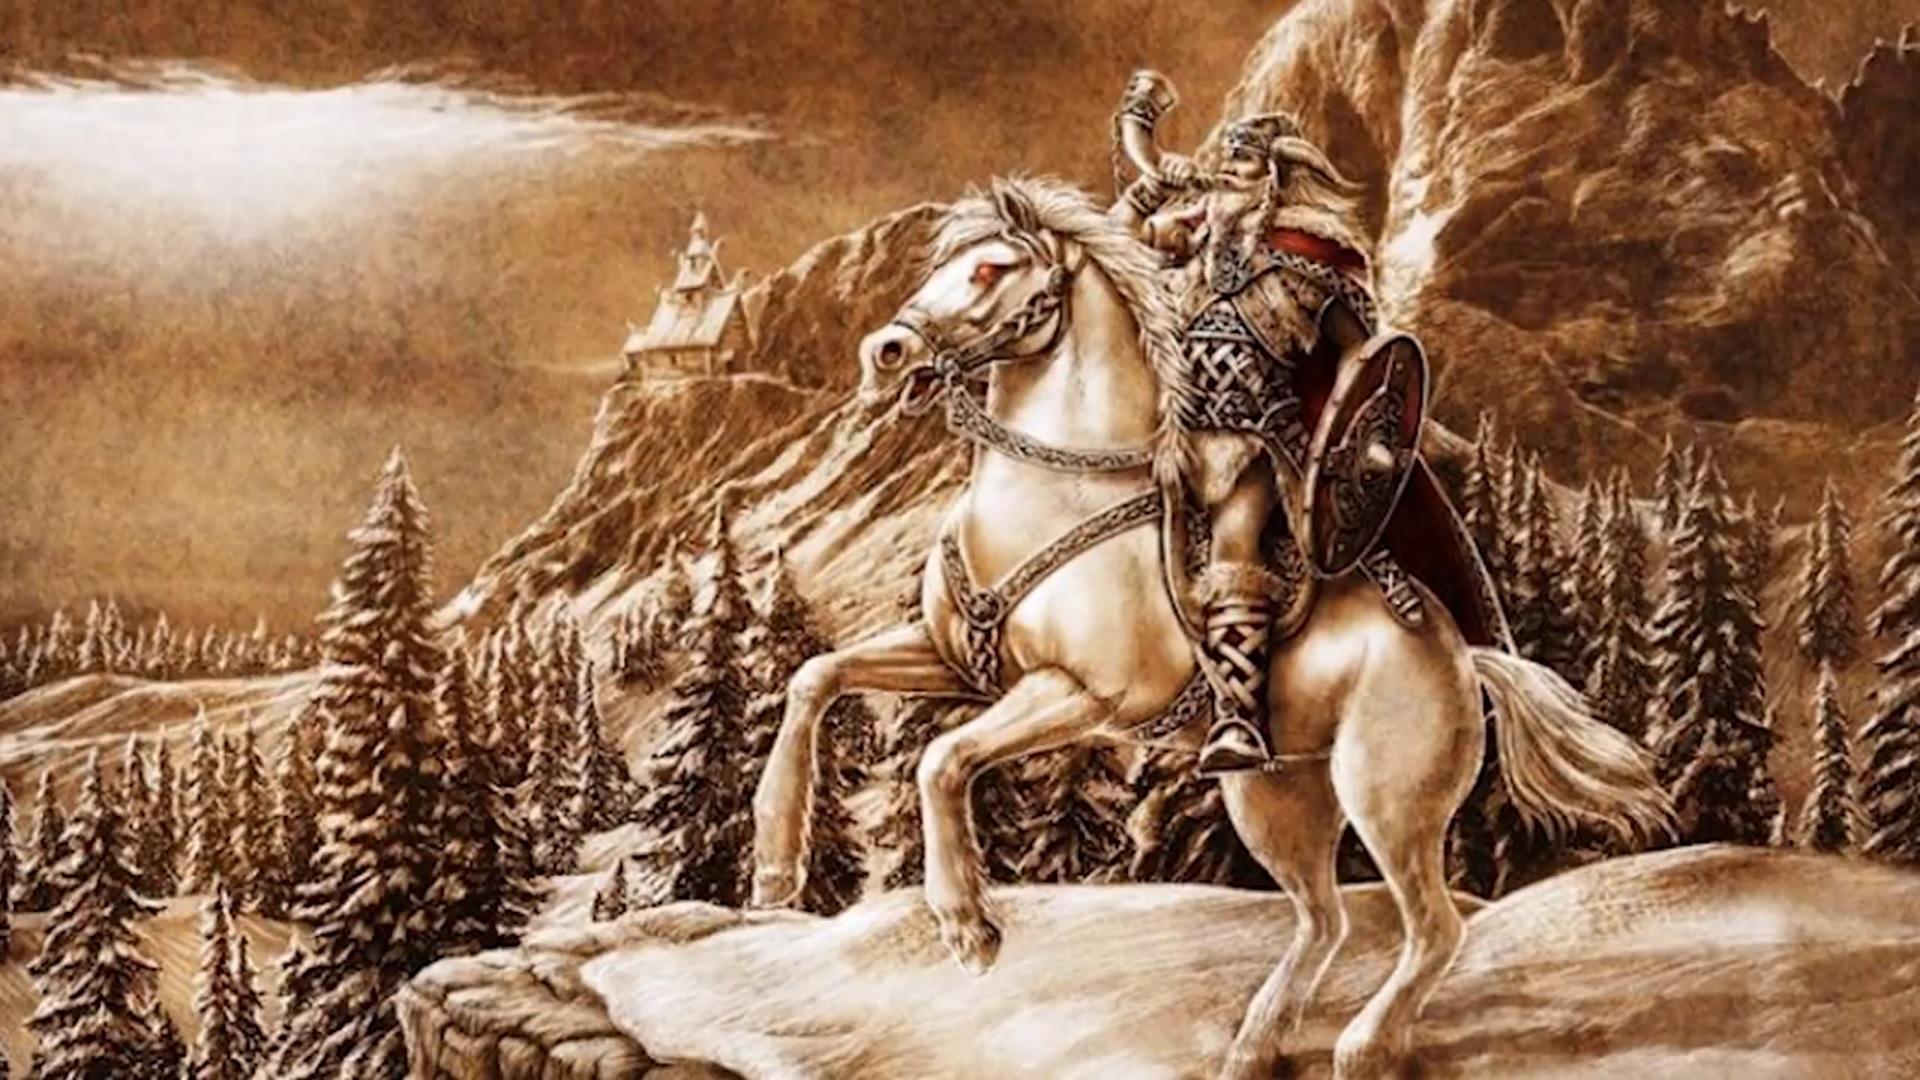 Exploring Norse Mythology: Heimdall the Watcher (Хеймдалль Смотритель)